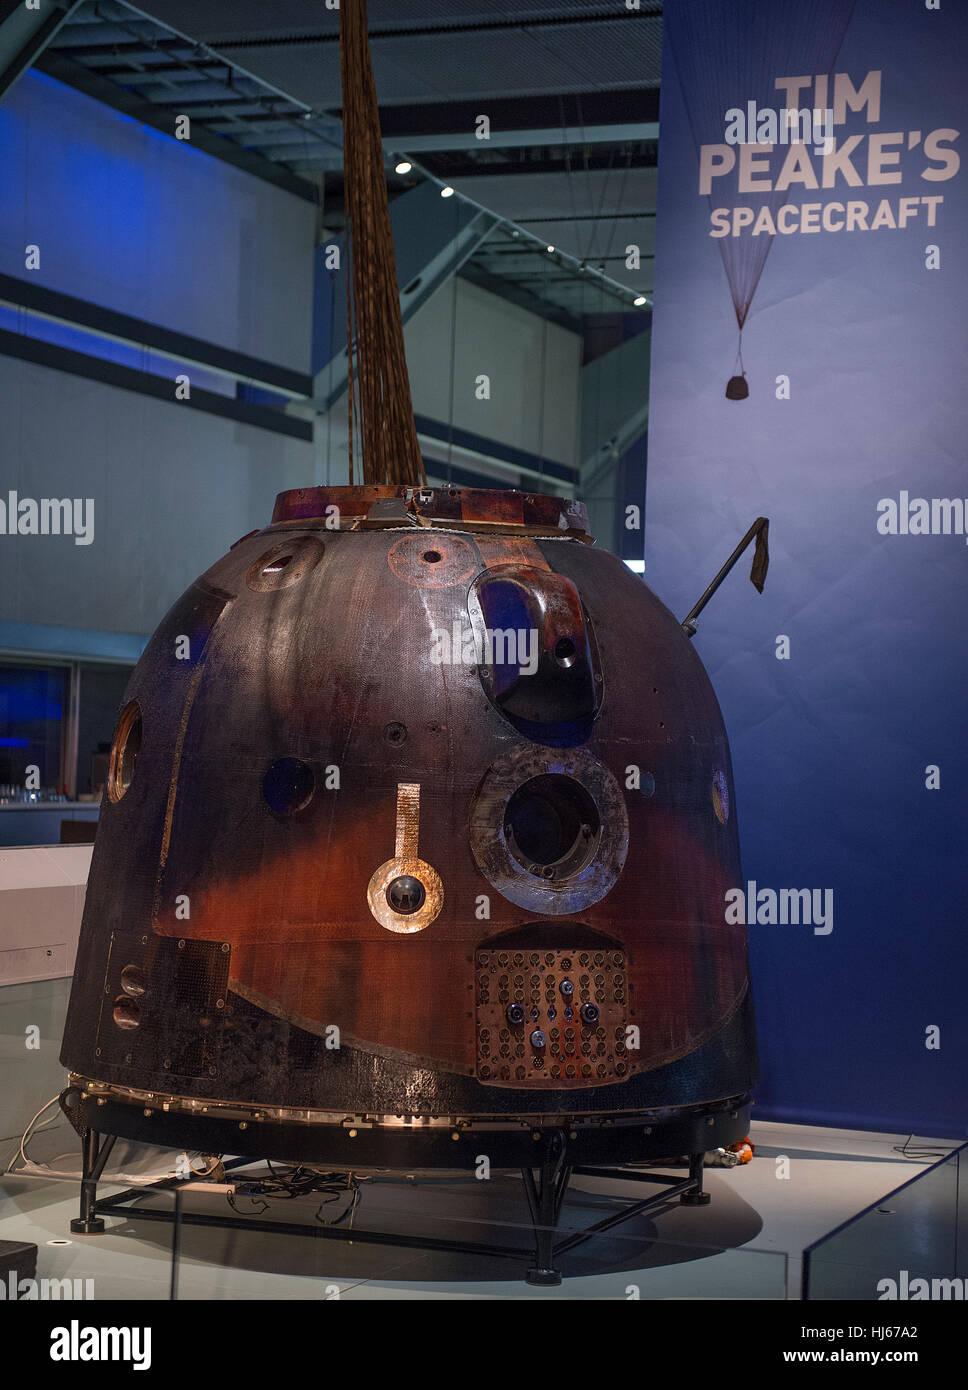 Science Museum, London, UK. 26th January, 2017. Tim Peake's spacecraft - Soyuz TMA-19M - is now on free public - Stock Image